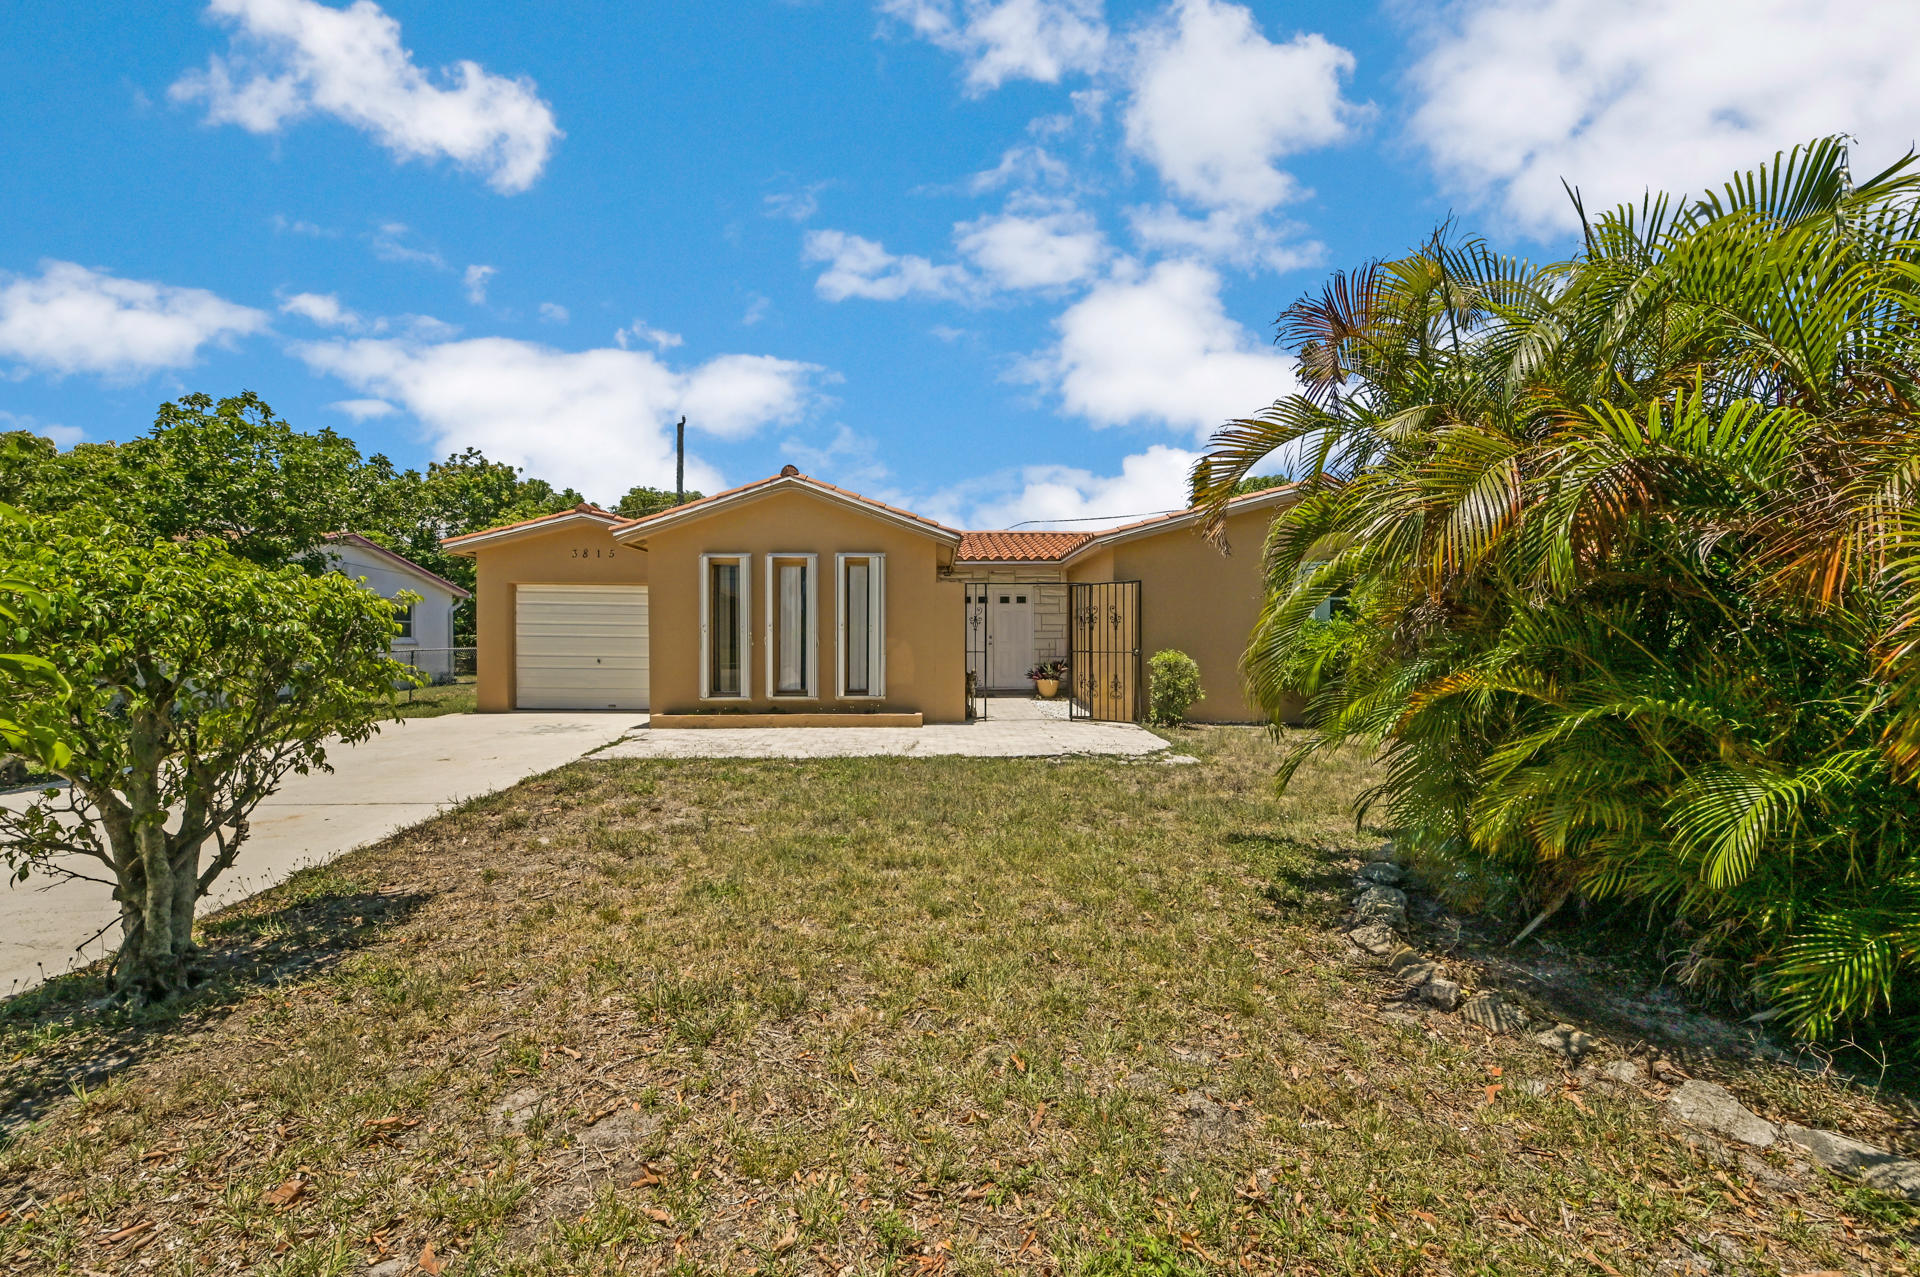 3815 N Shore Drive  For Sale 10721149, FL